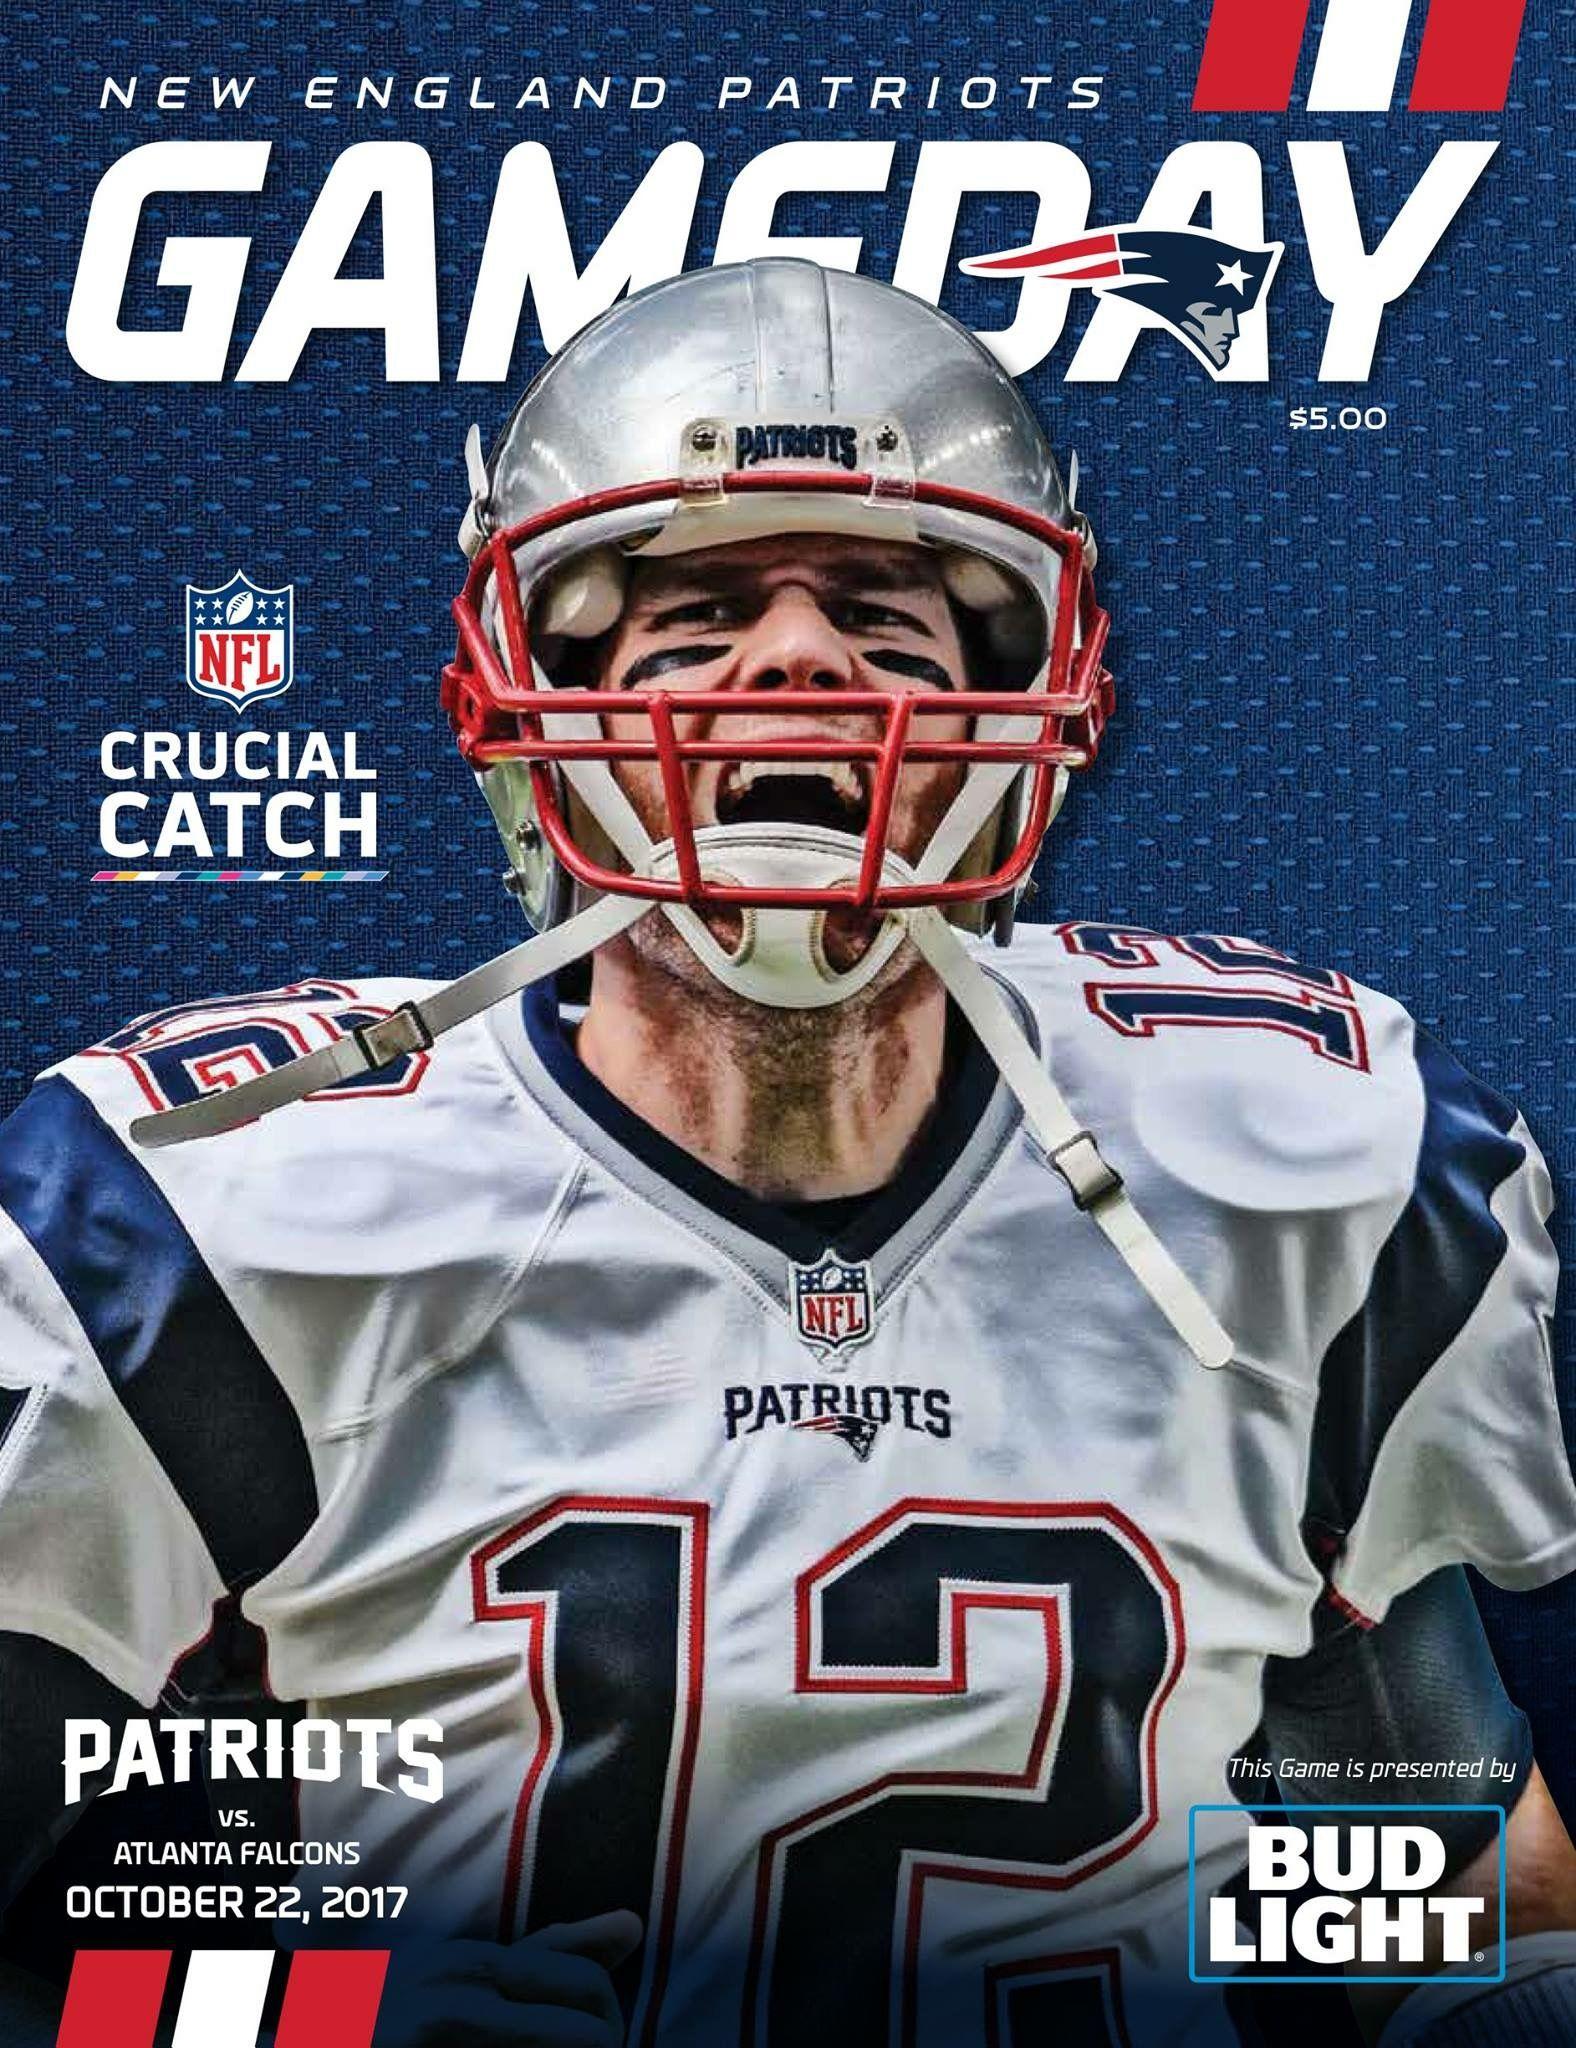 Gameday Program Cover Tb12 Goat Wk7 Atlvsne Letsgo Nfl Patriots Patriots Football Helmets